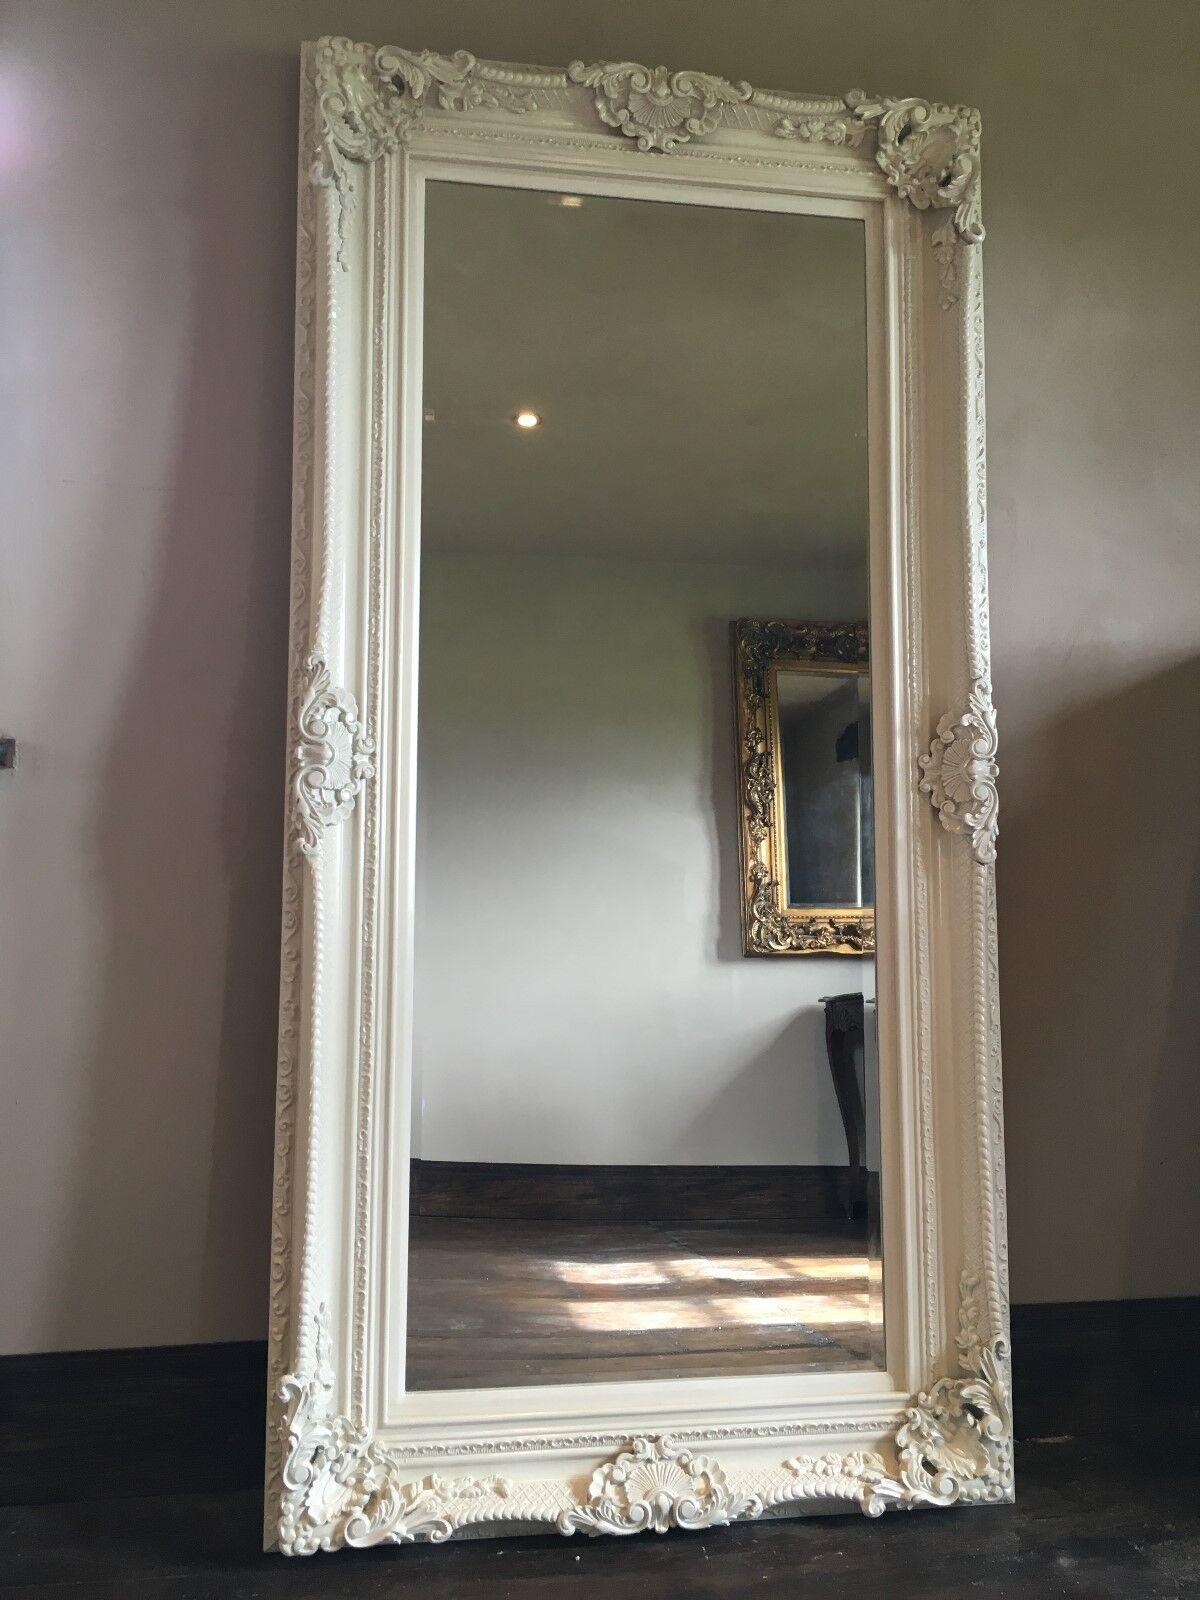 Antique White Cream French Statement Vintage Leaner Dress Floor Wall Mirror 6ft Ebay